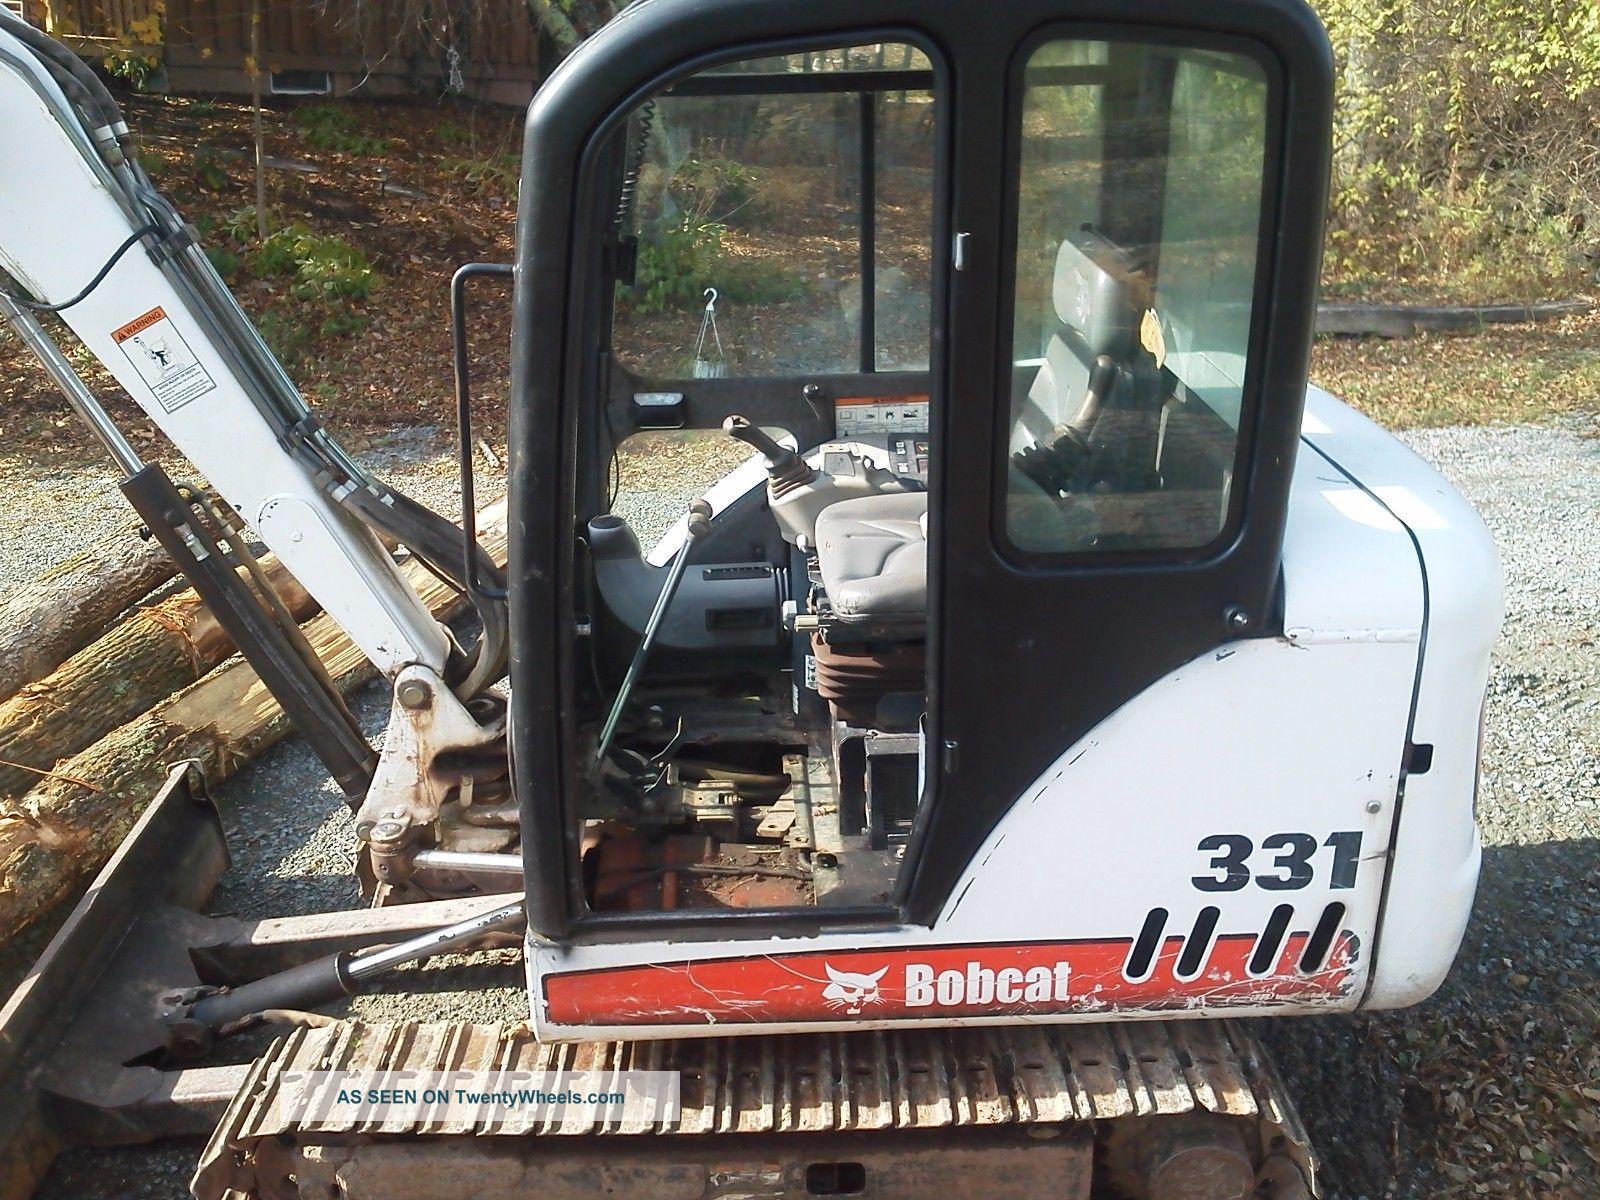 Bobcat 331g, Mini Excavator, Cab Heat, 2 Speed, Only 1400 Hrs